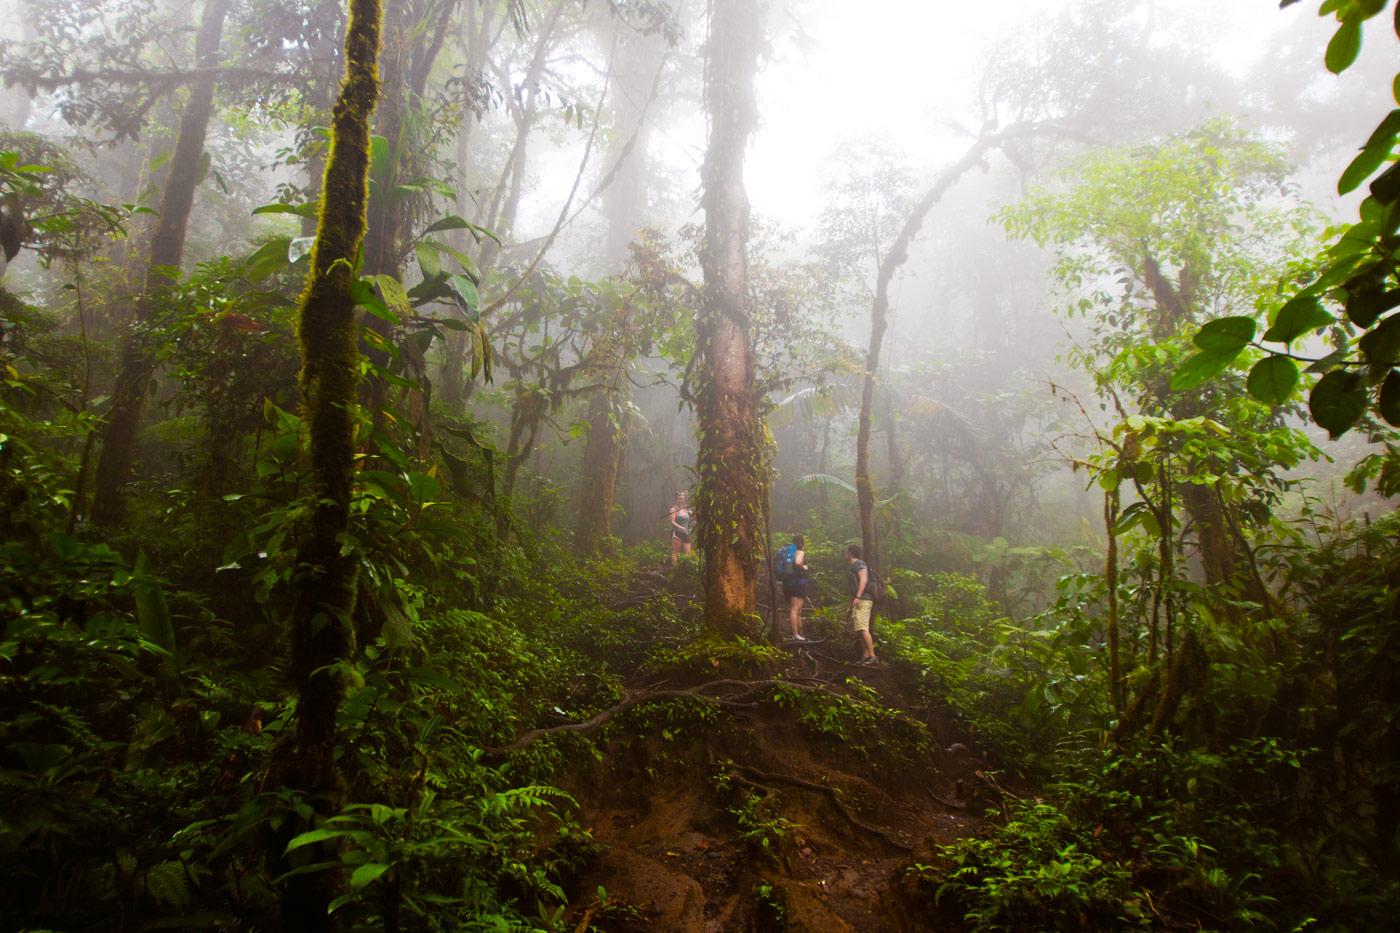 Nick-Zantop-Photography-Rainforest-7